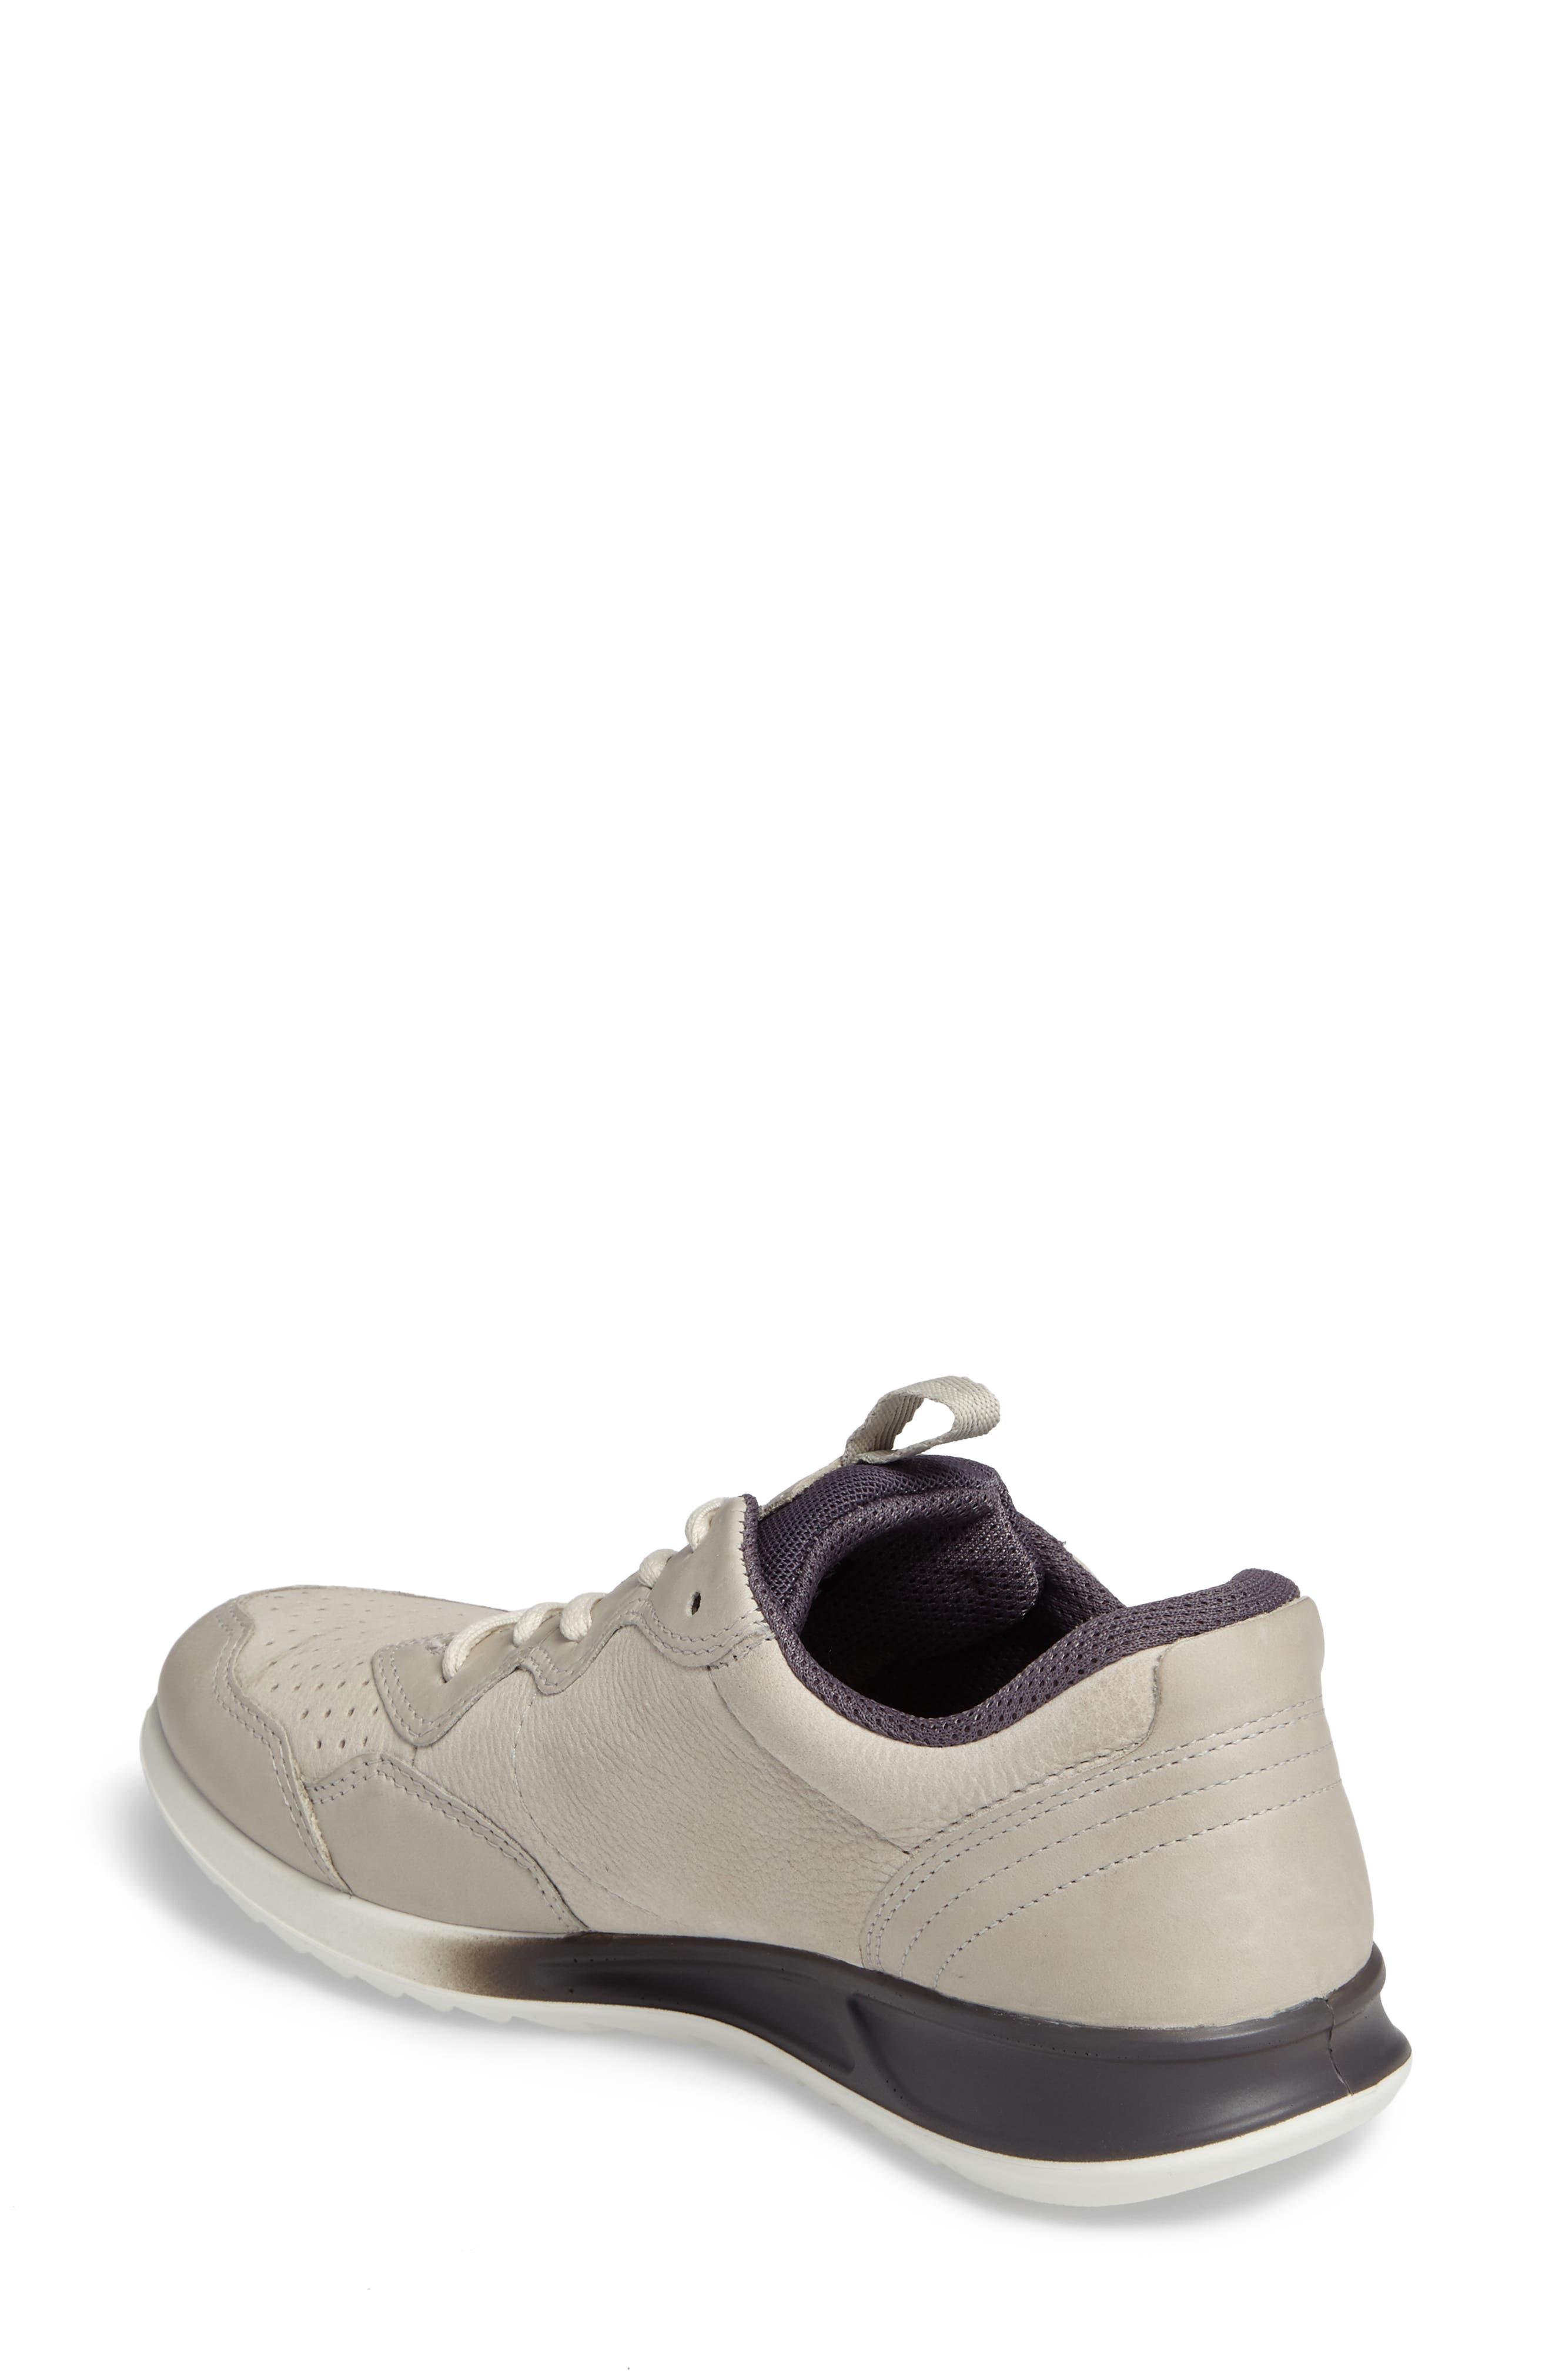 Genna Sneaker,                             Alternate thumbnail 6, color,